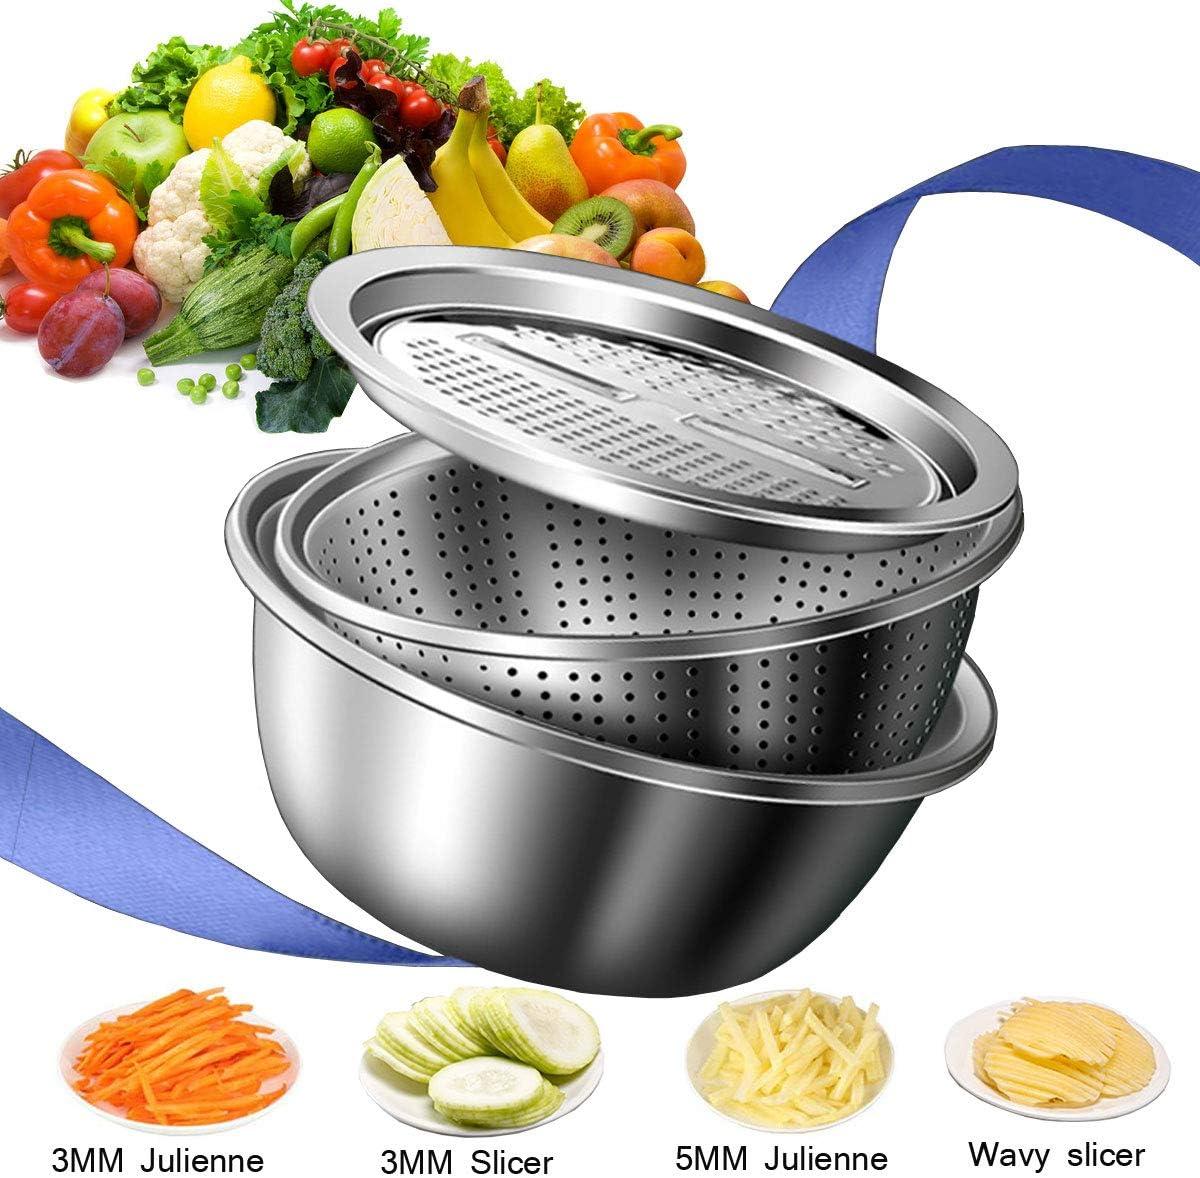 Jeslon Stainless steel drain basket vegetable cutter, 3 in 1 Kitchen Multipurpose Julienne Grater - salad maker bowl